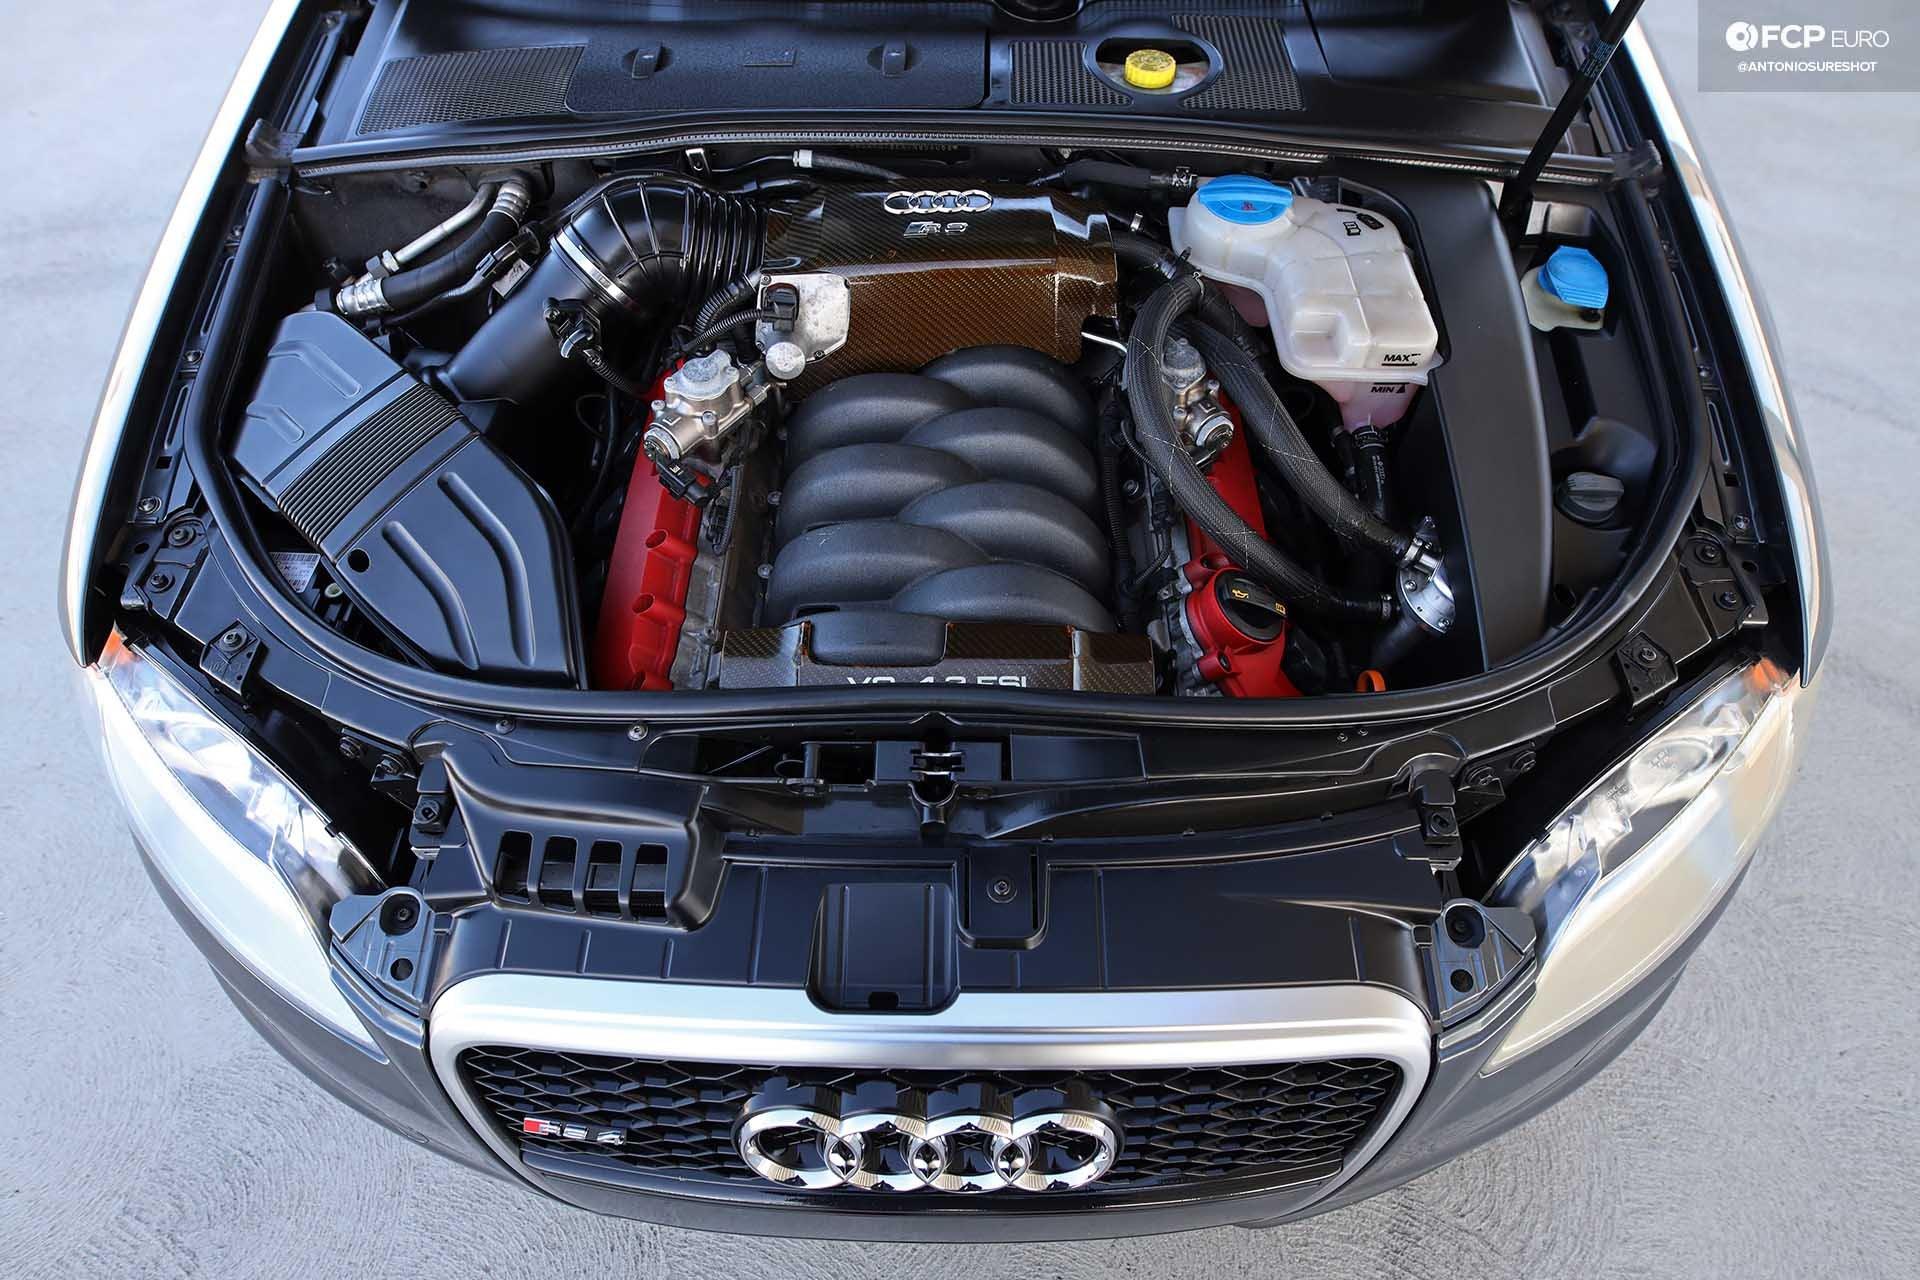 B7 Audi RS4 engine bay